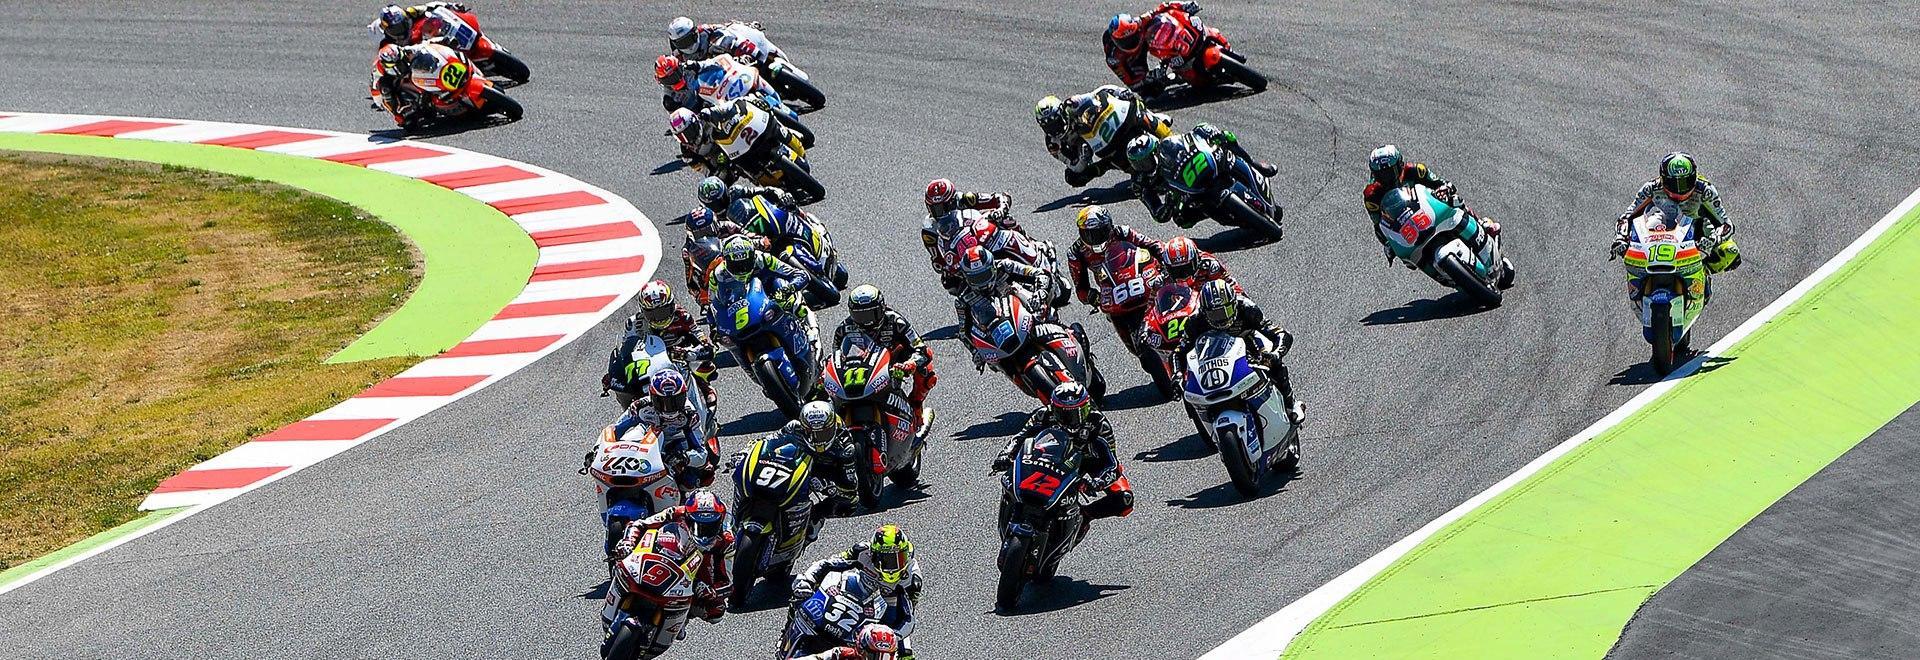 GP Valencia: Moto3. Race 2